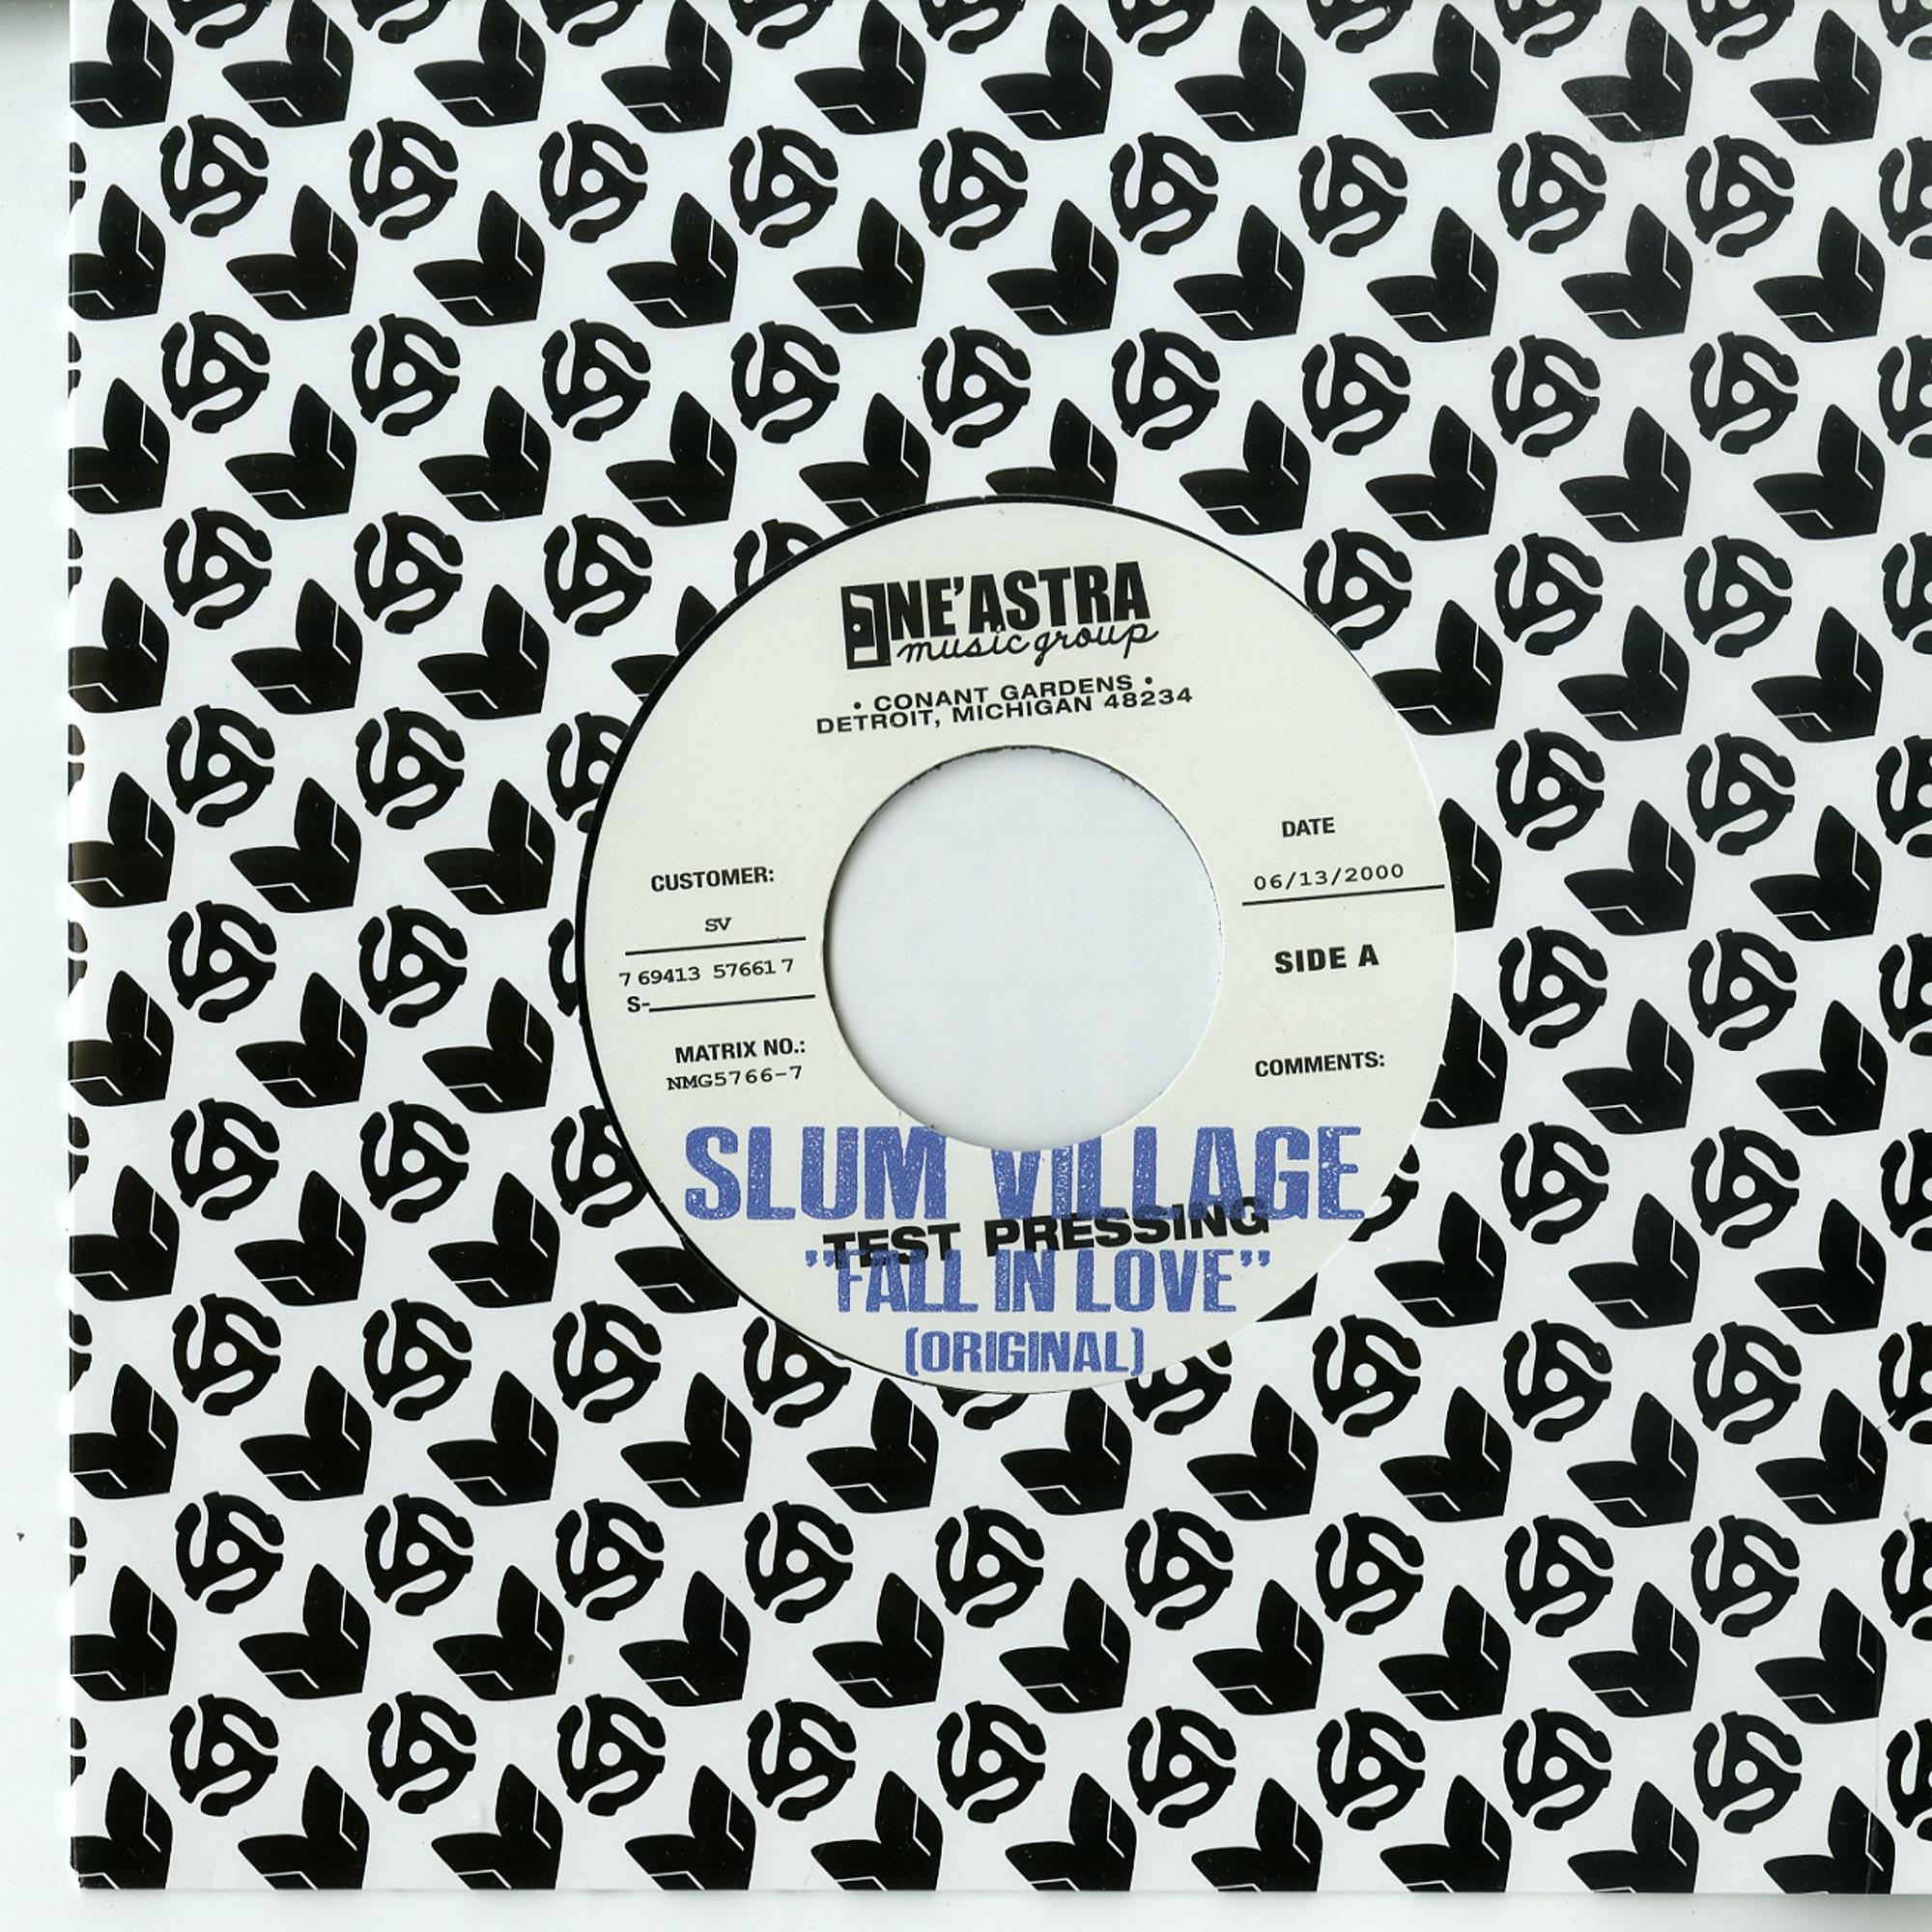 Slum Village - FALL IN LOVE